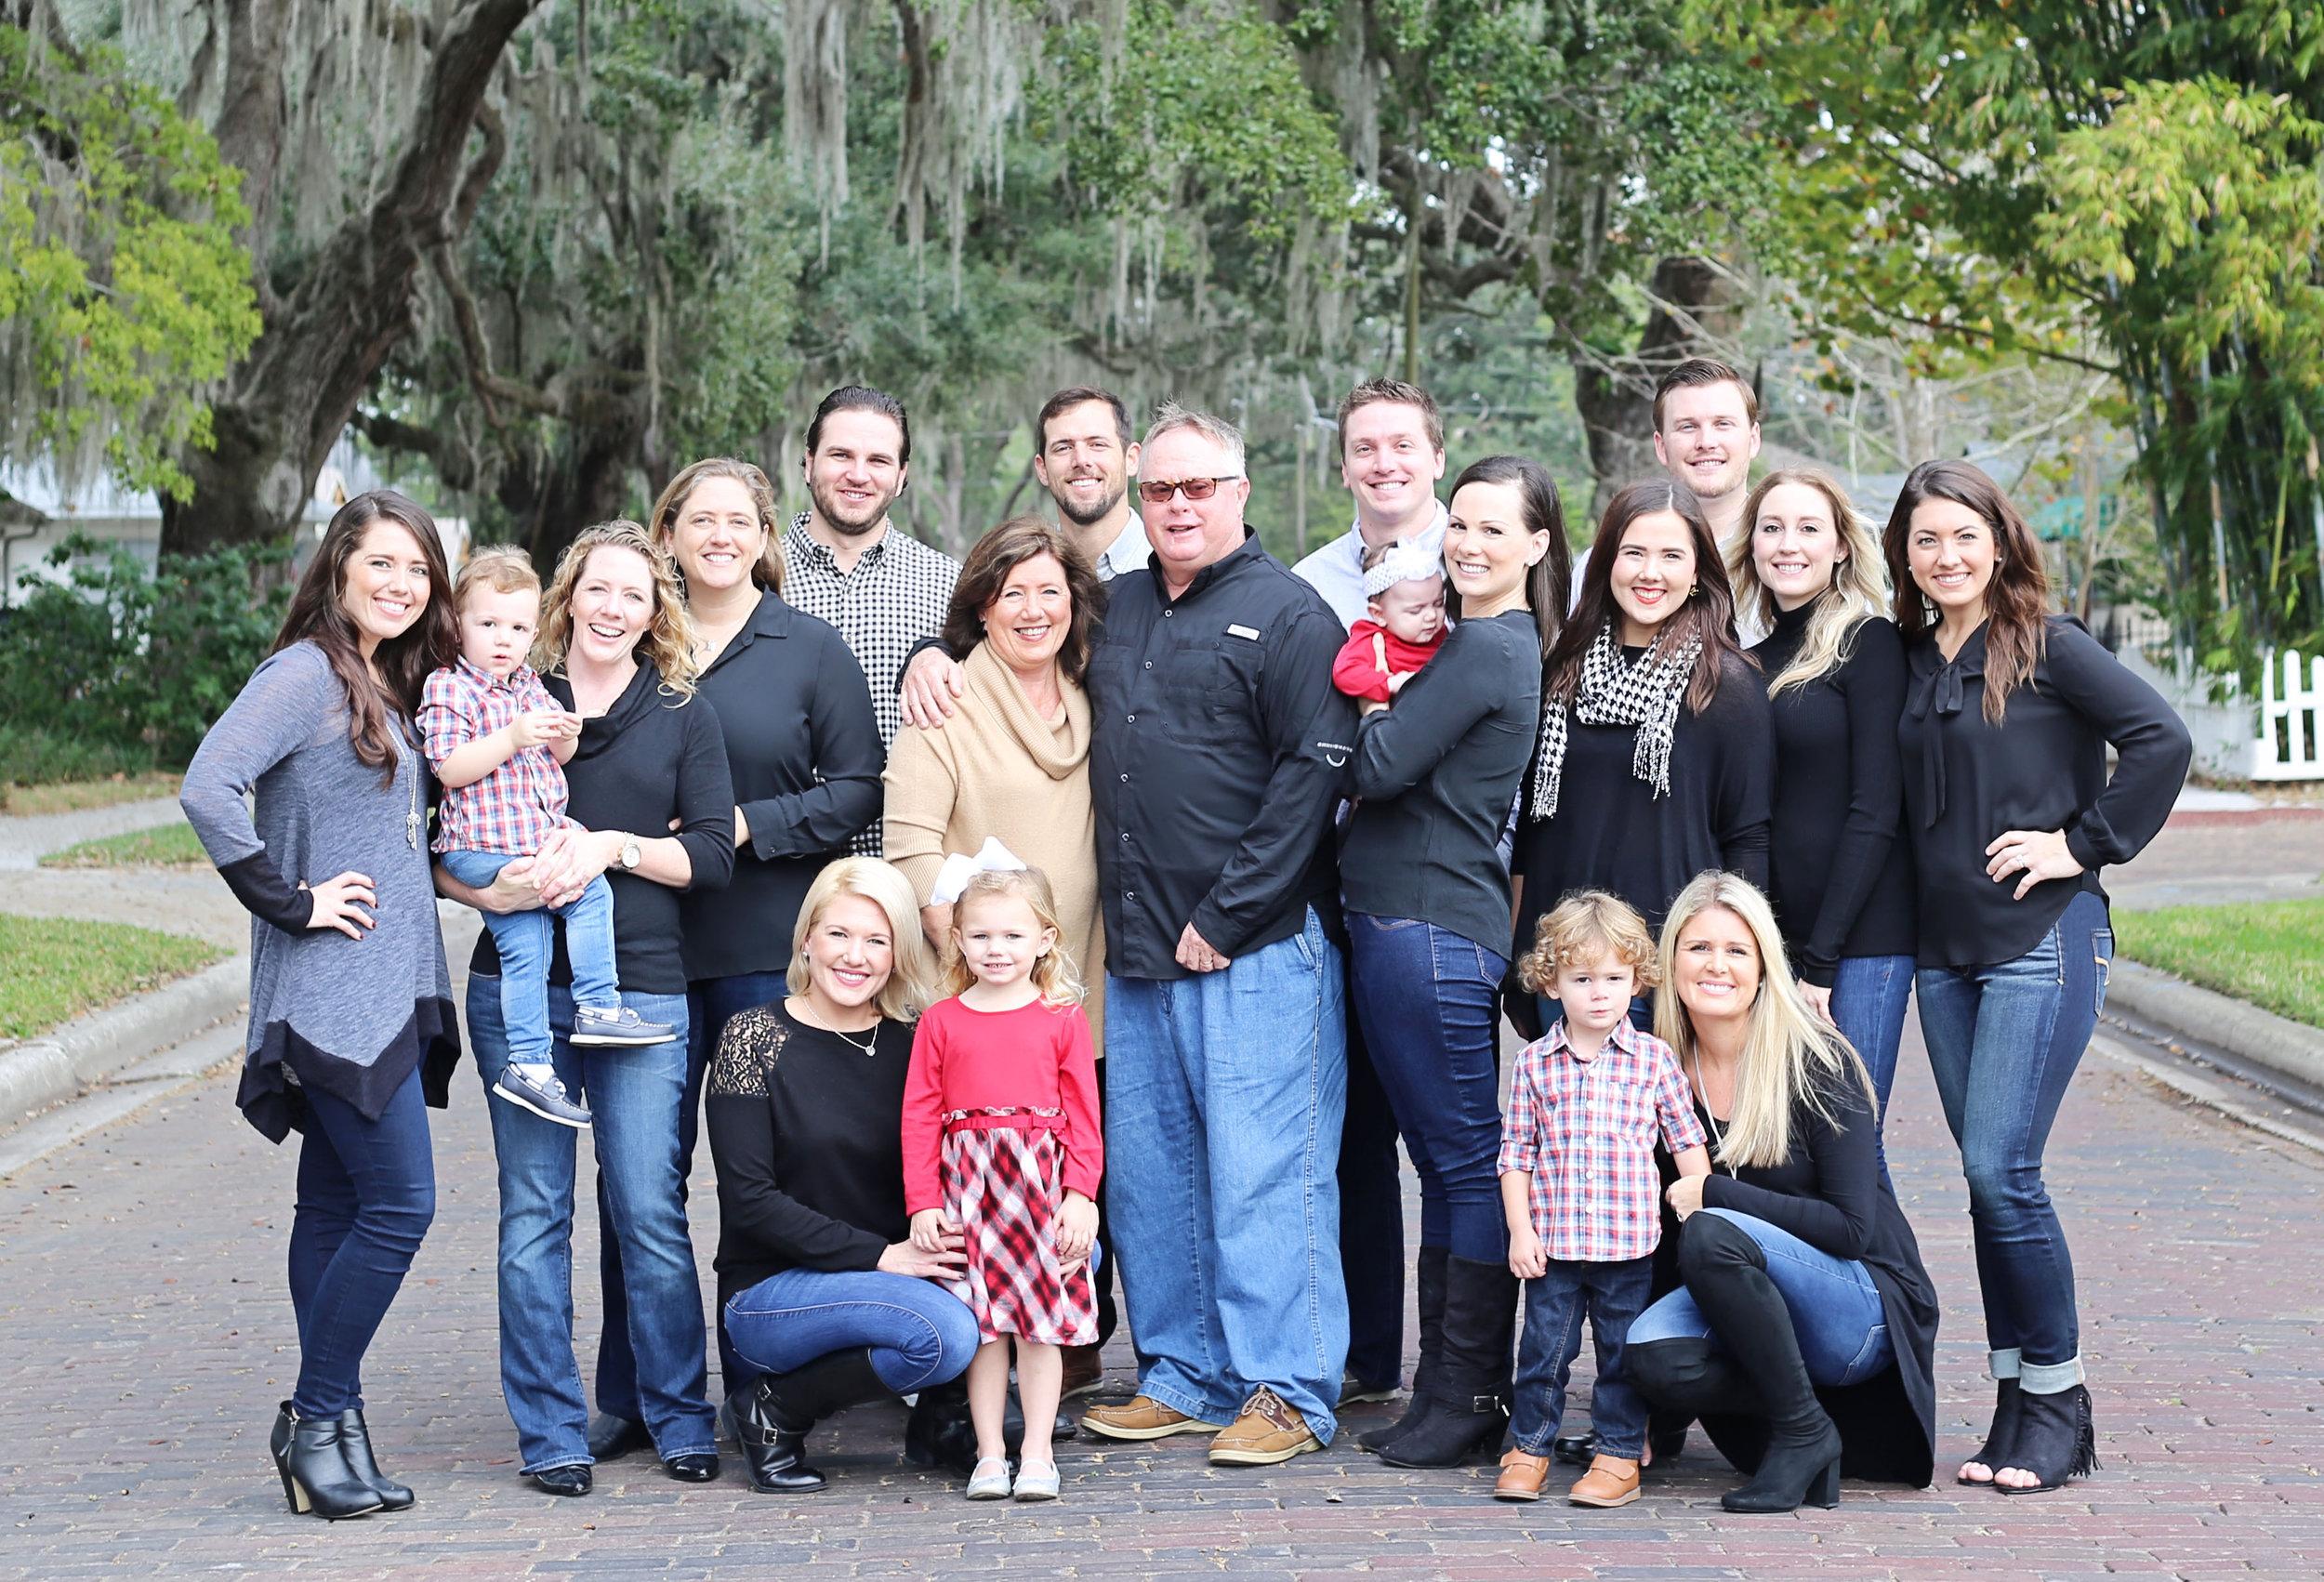 clarkfamily34updated - Copy.jpg